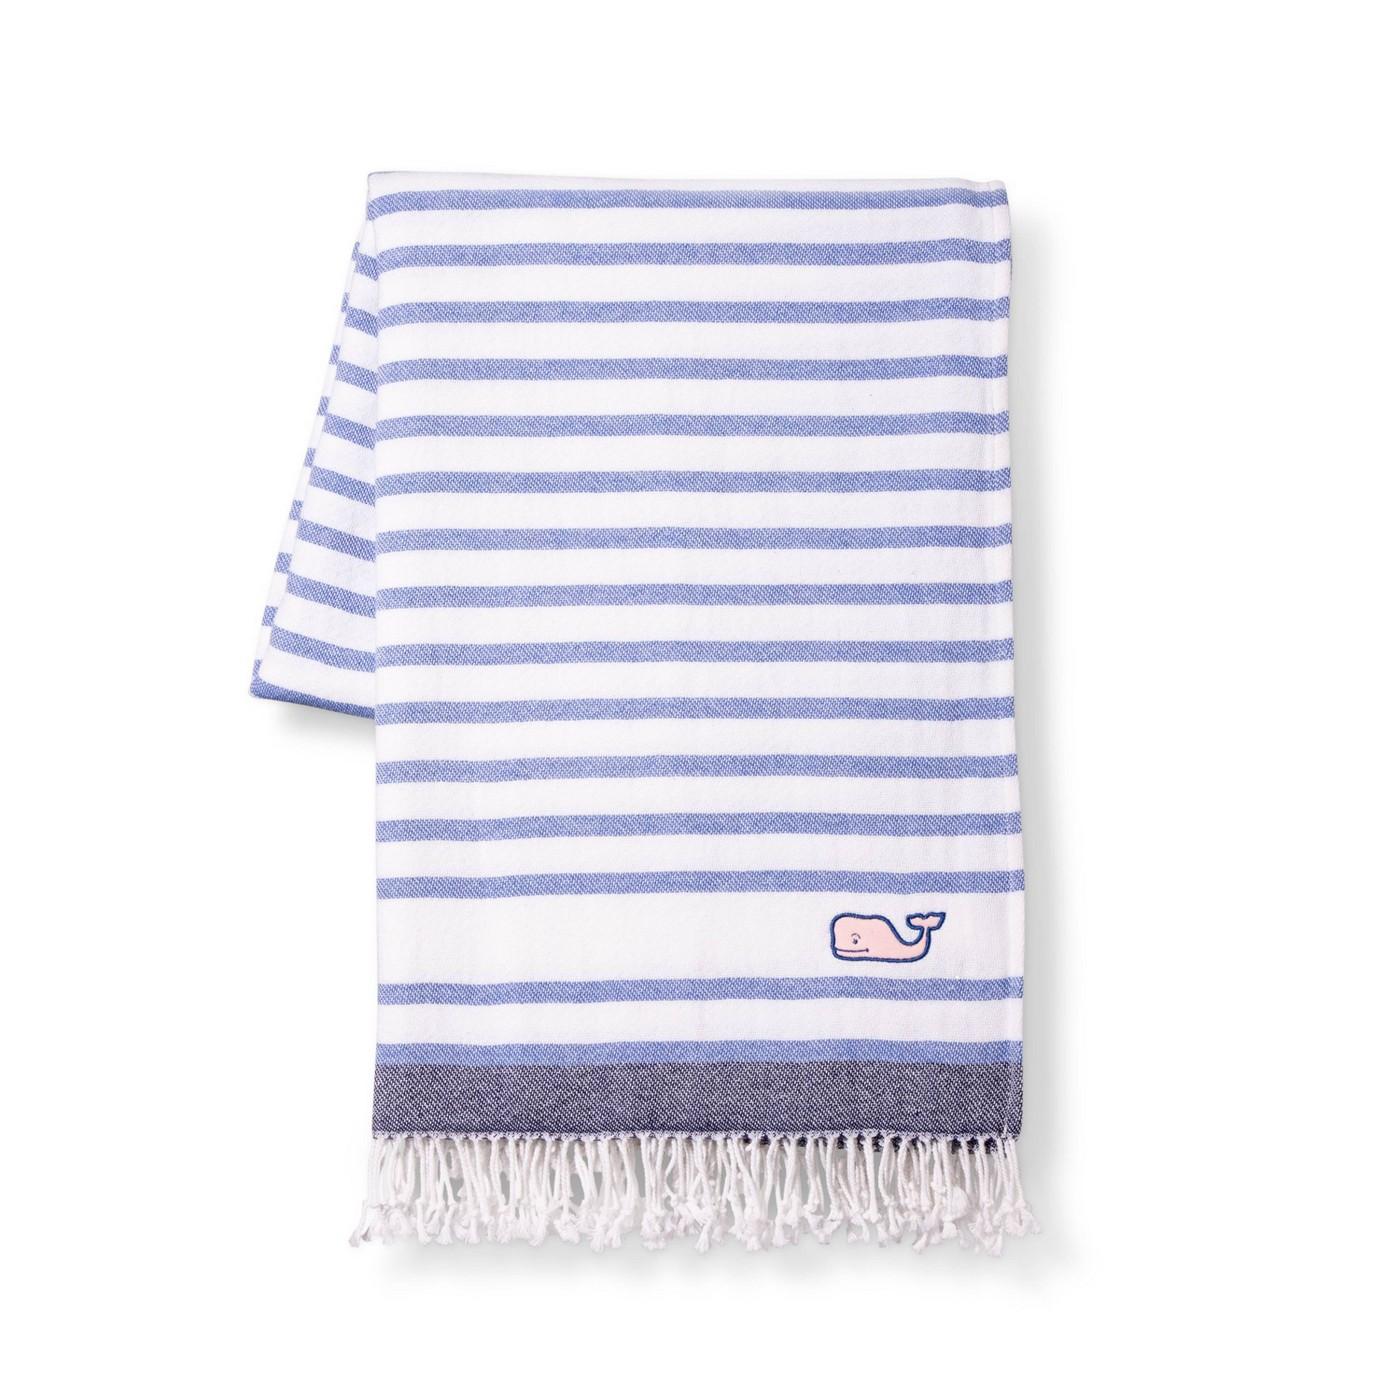 Striped Throw Blanket - Blue/White - vineyard vines® for Target - image 1 of 2